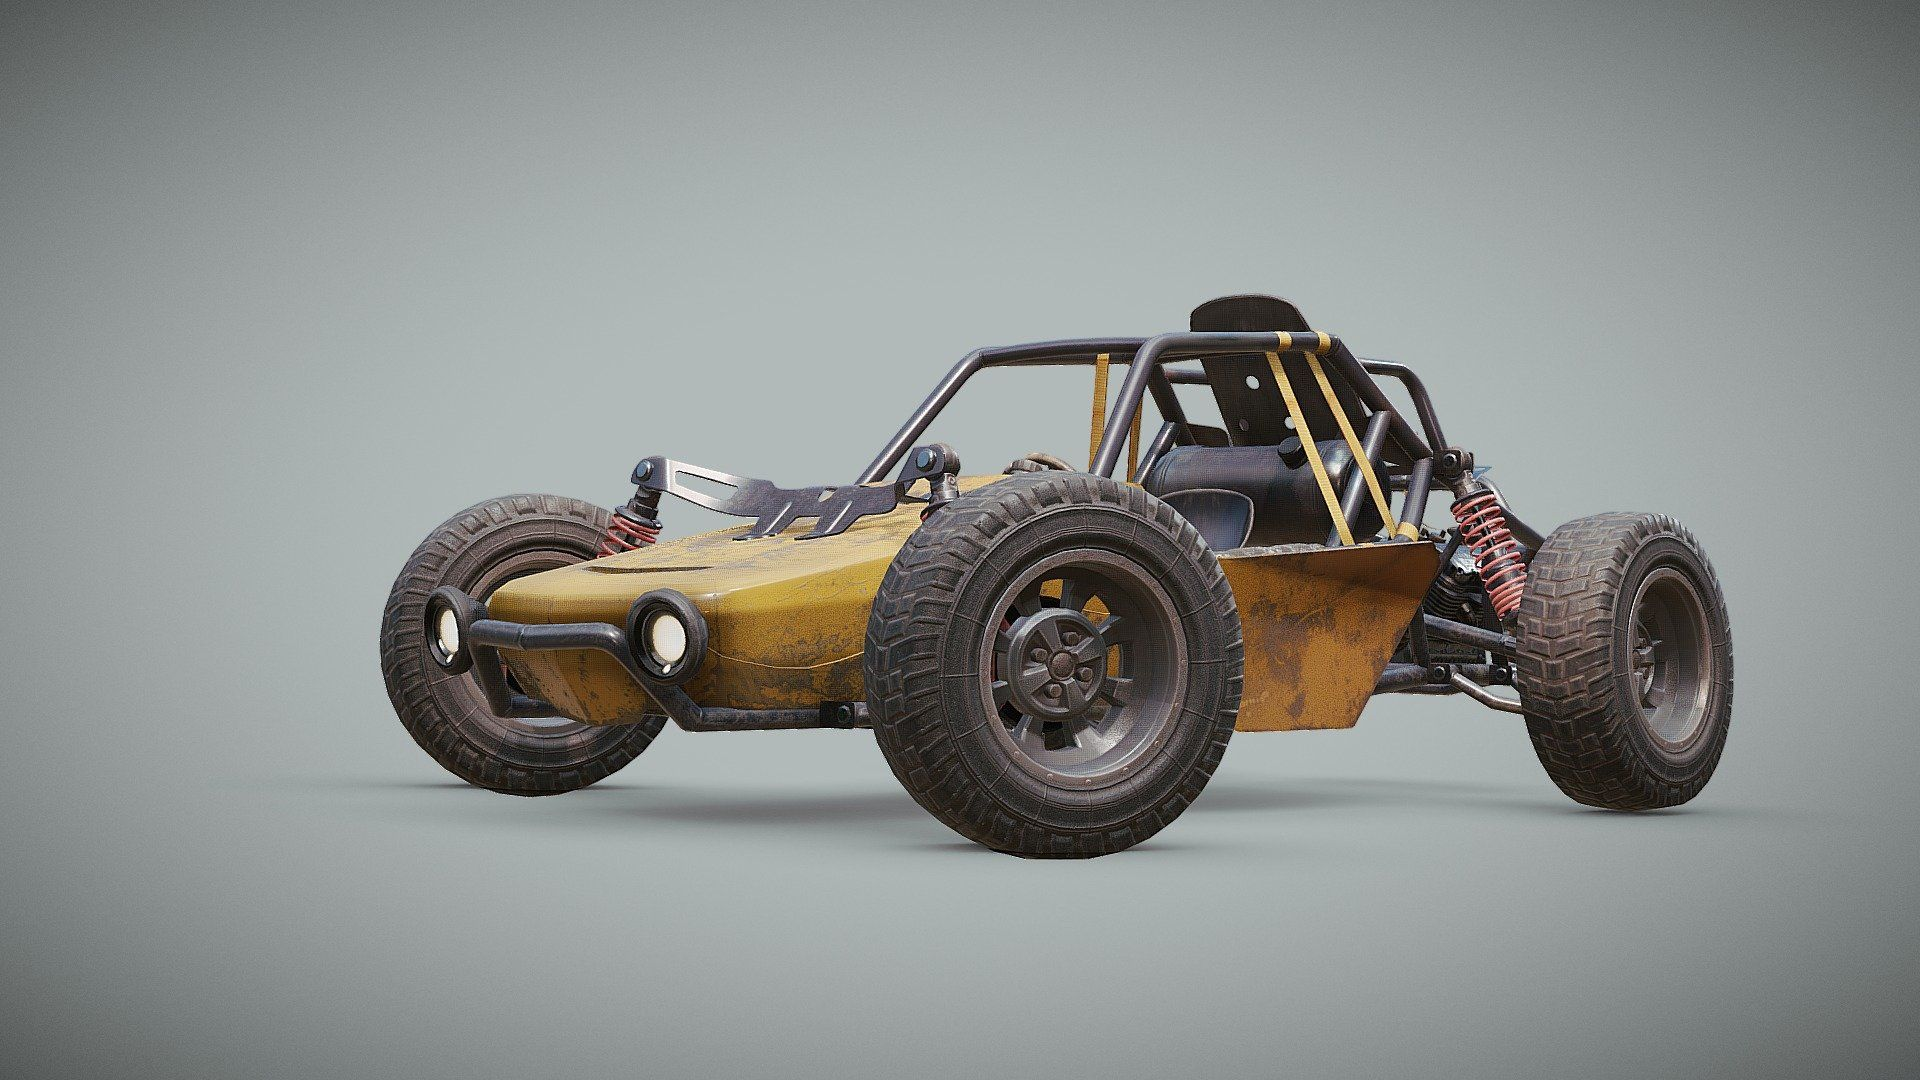 3d Model Playerunknown S Battlegrounds Buggy By Kmiklas: PUBG: Buggy (Official) By Karolmiklas